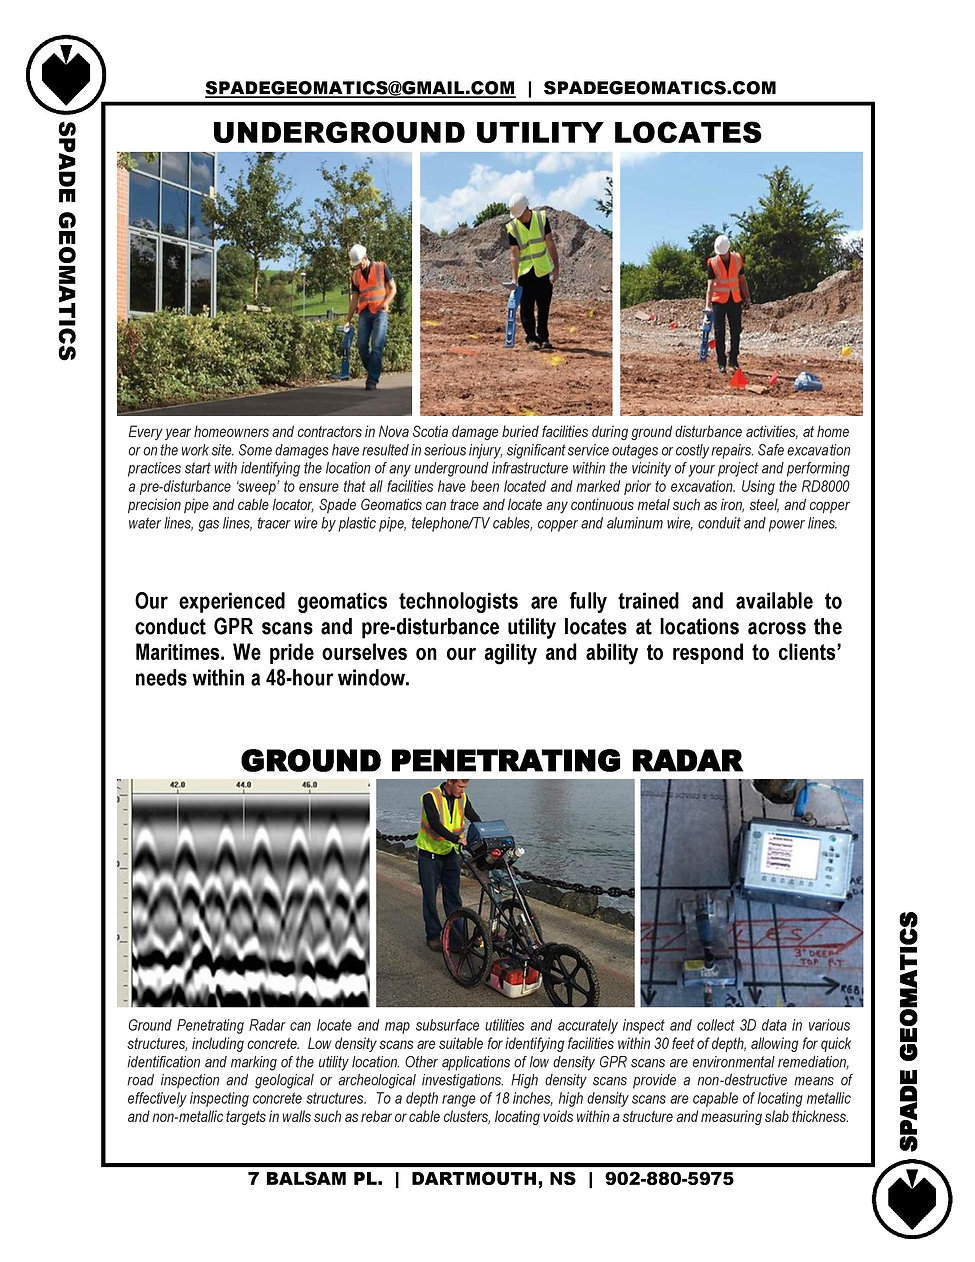 Utility Locates, Ground Penetrating Radar